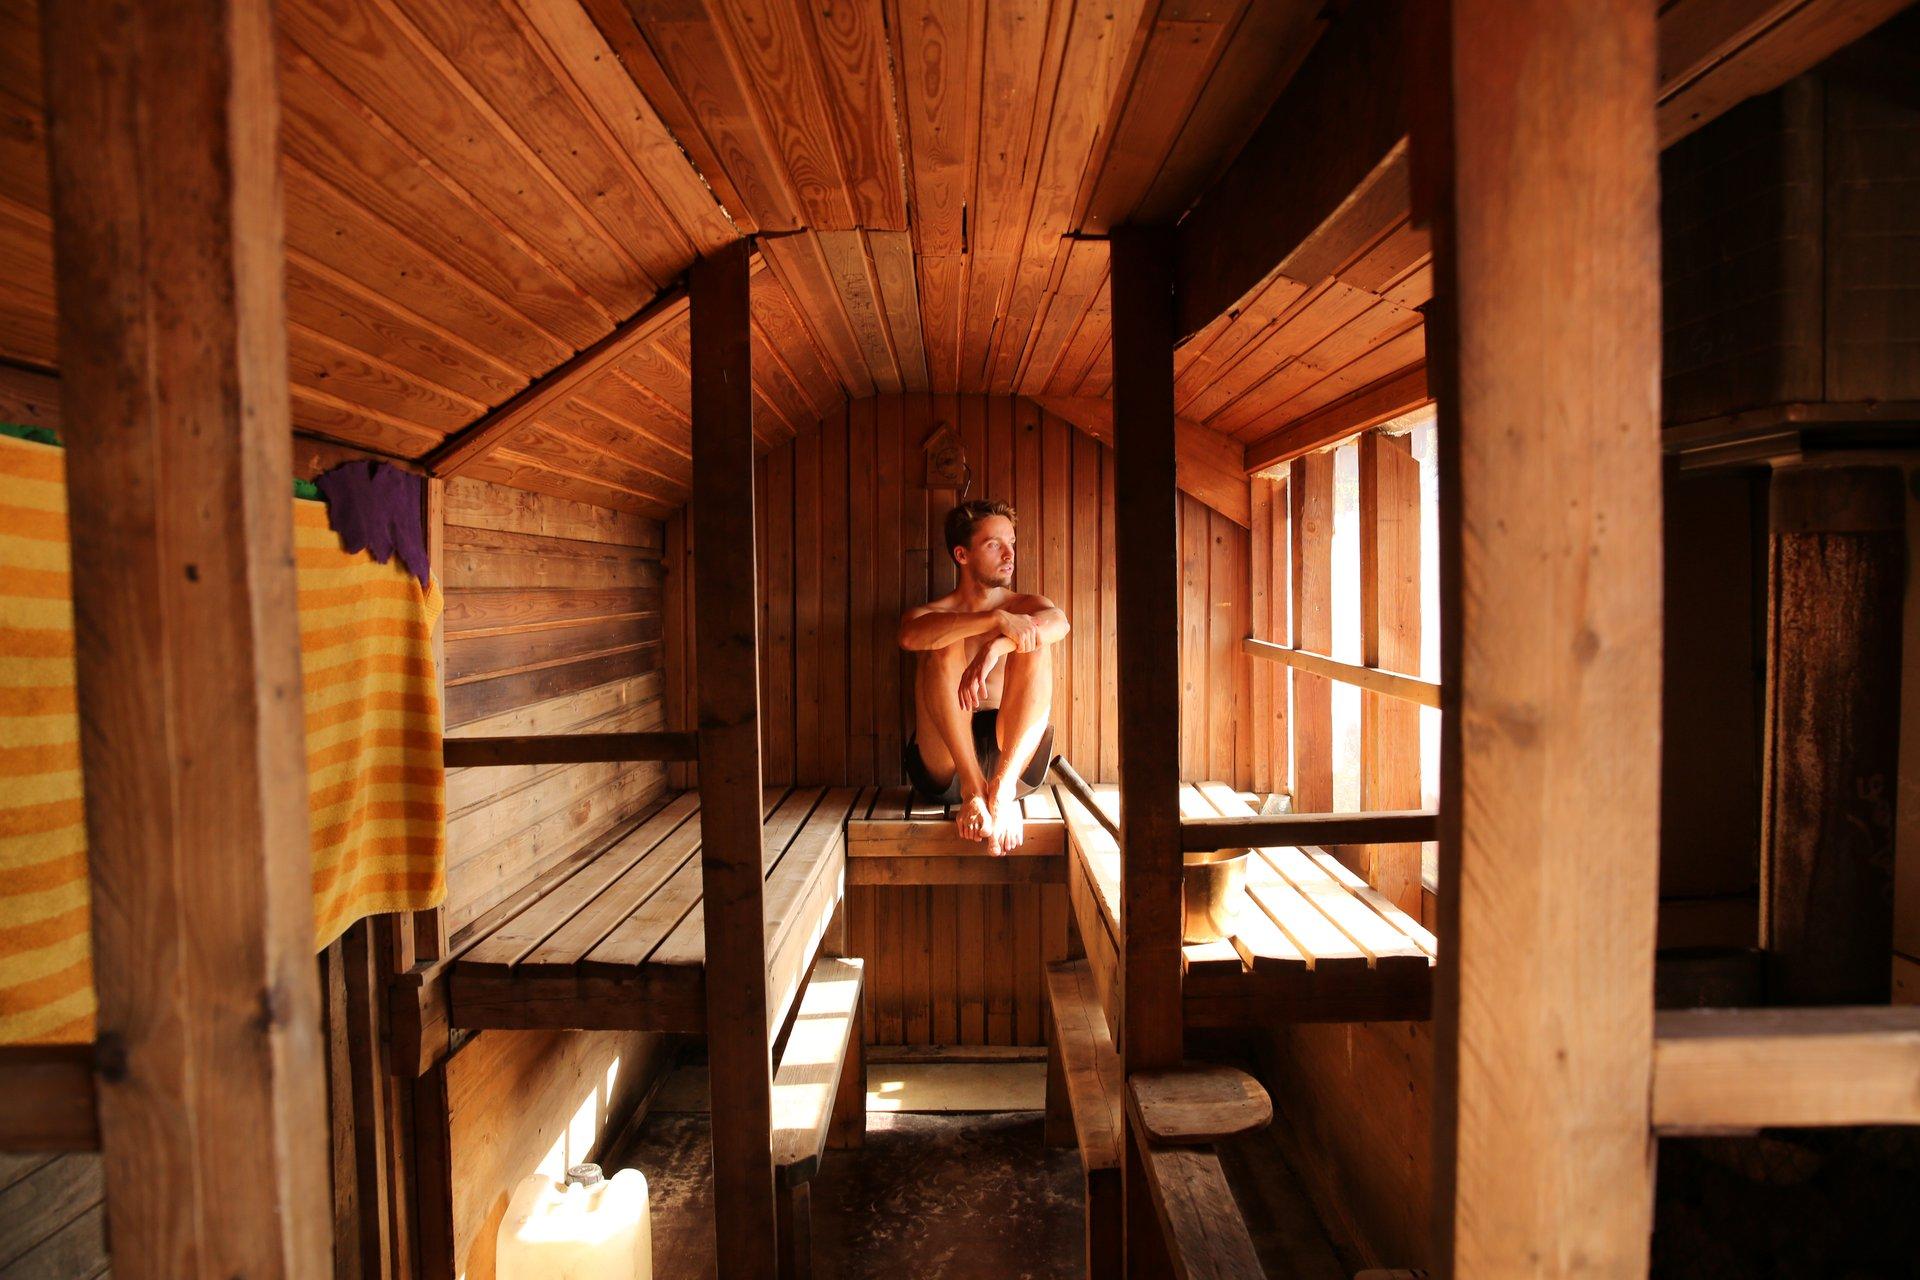 Helsinki Sauna Day in Finland 2019 - Best Time